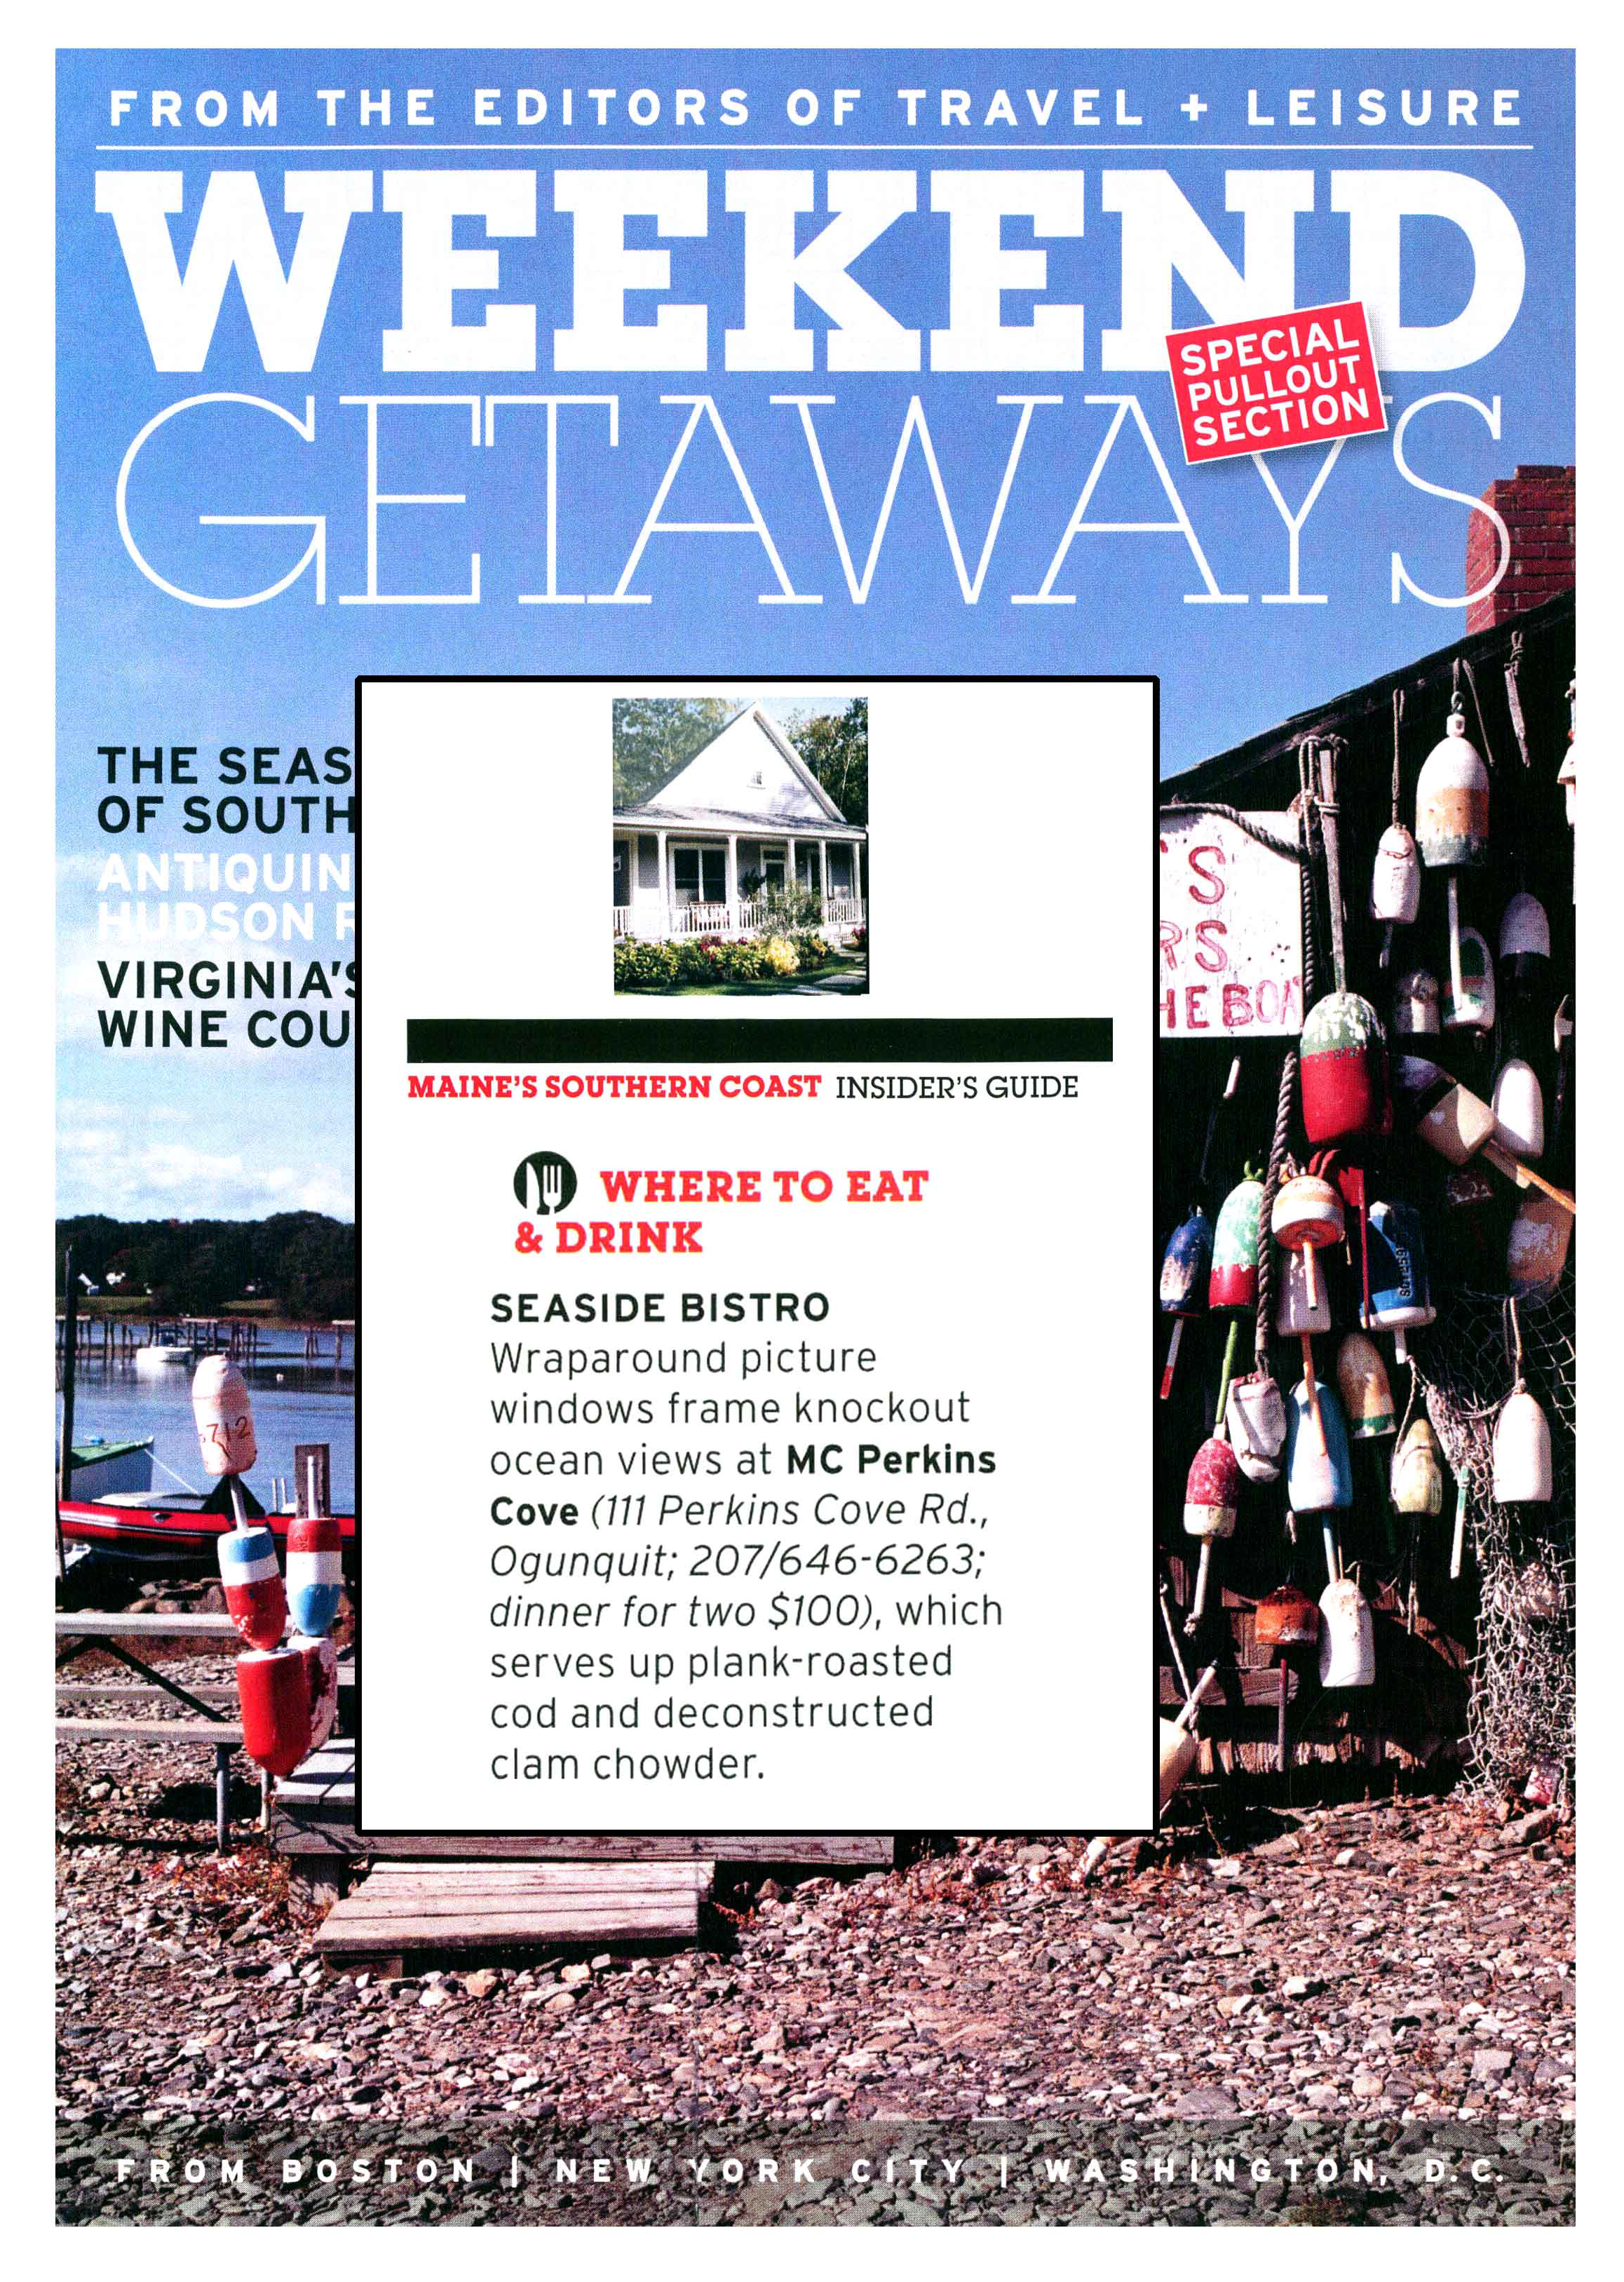 Travel & Leisure, Getaways, Mark Gaier, Clark Frasier, MC Perkins Cove